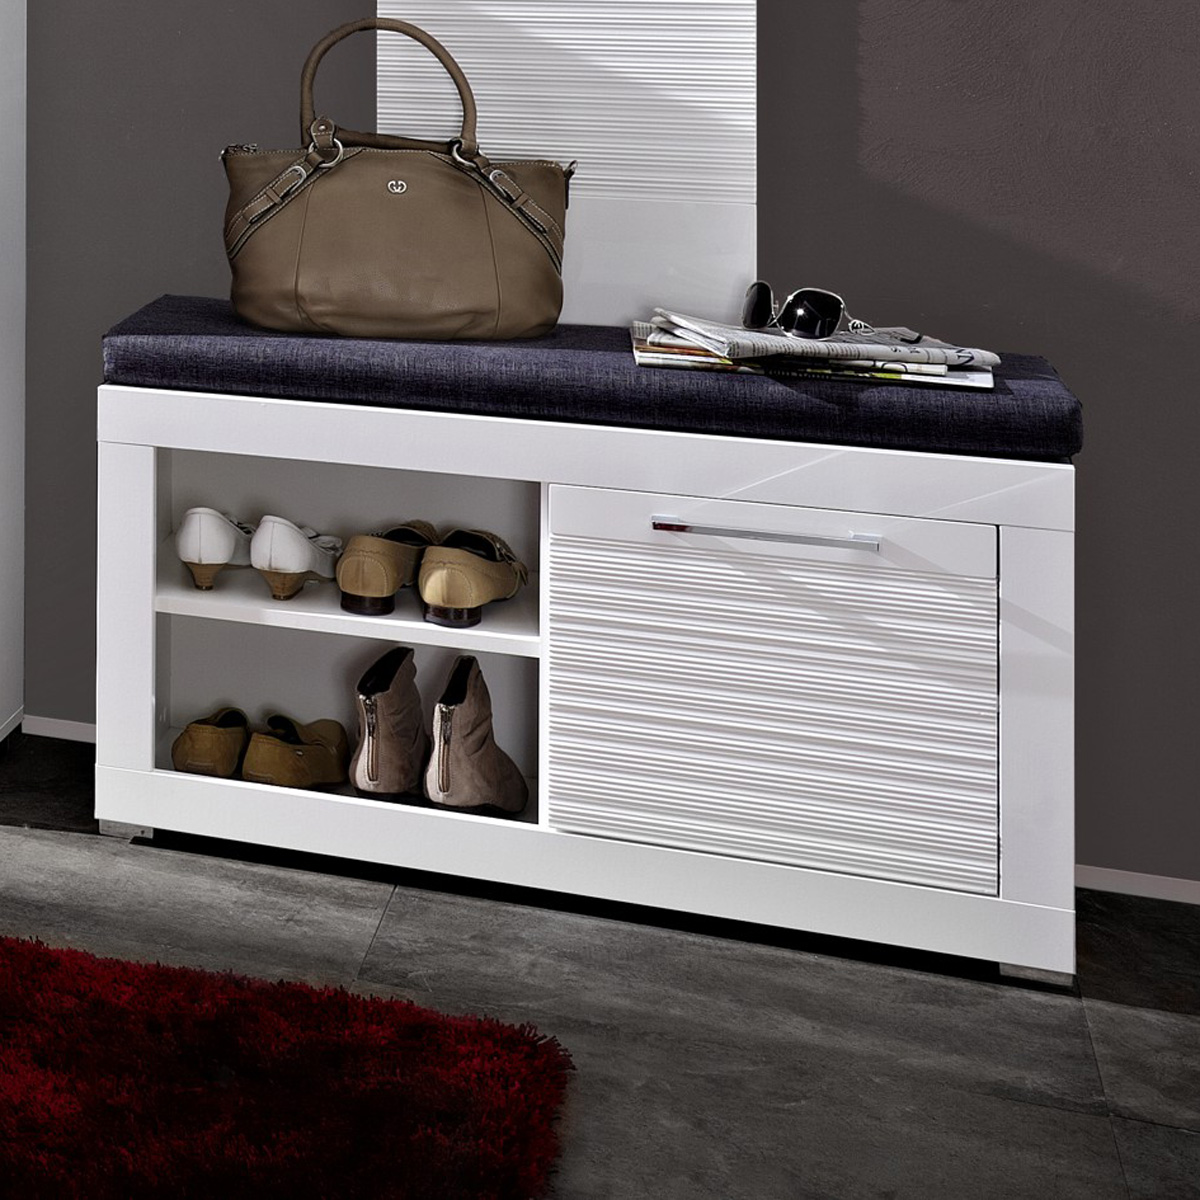 bank file sitzbank inkl sitzkissen wei hochglanz. Black Bedroom Furniture Sets. Home Design Ideas